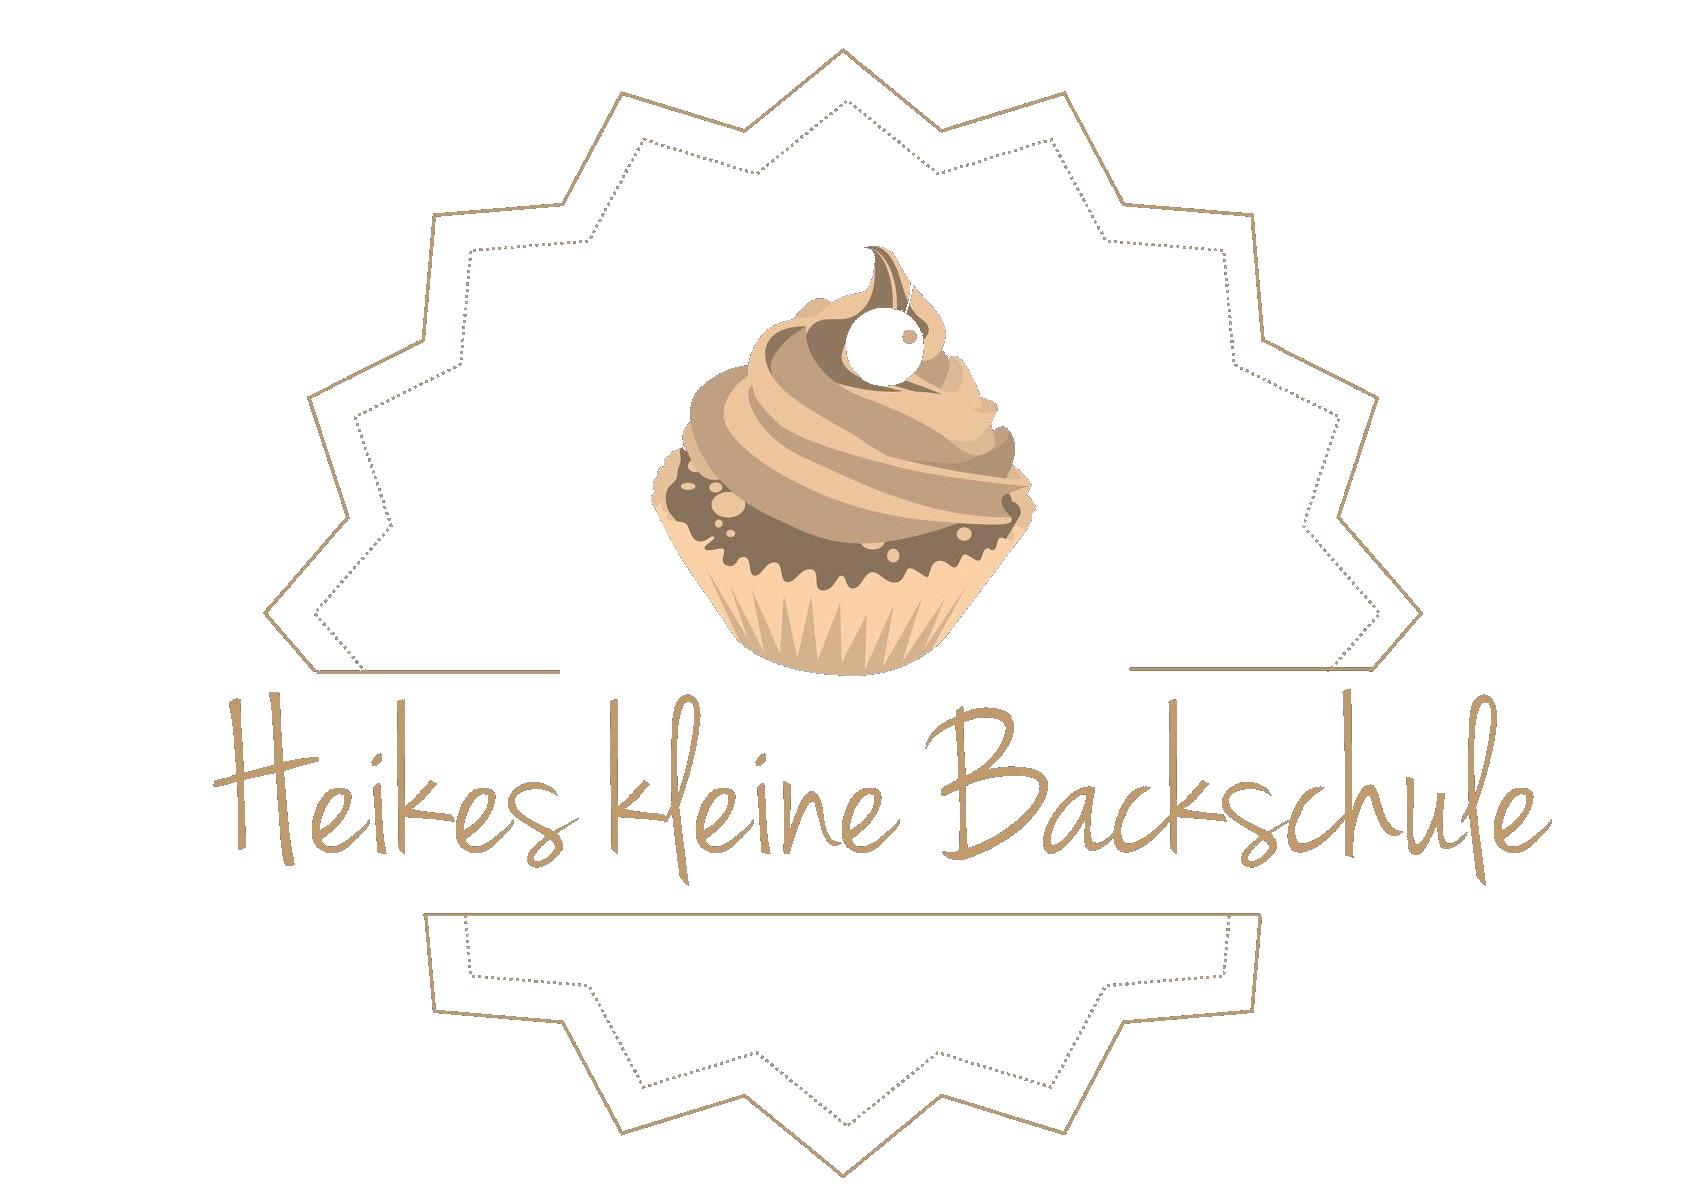 Heikes kleine Backschule Logo